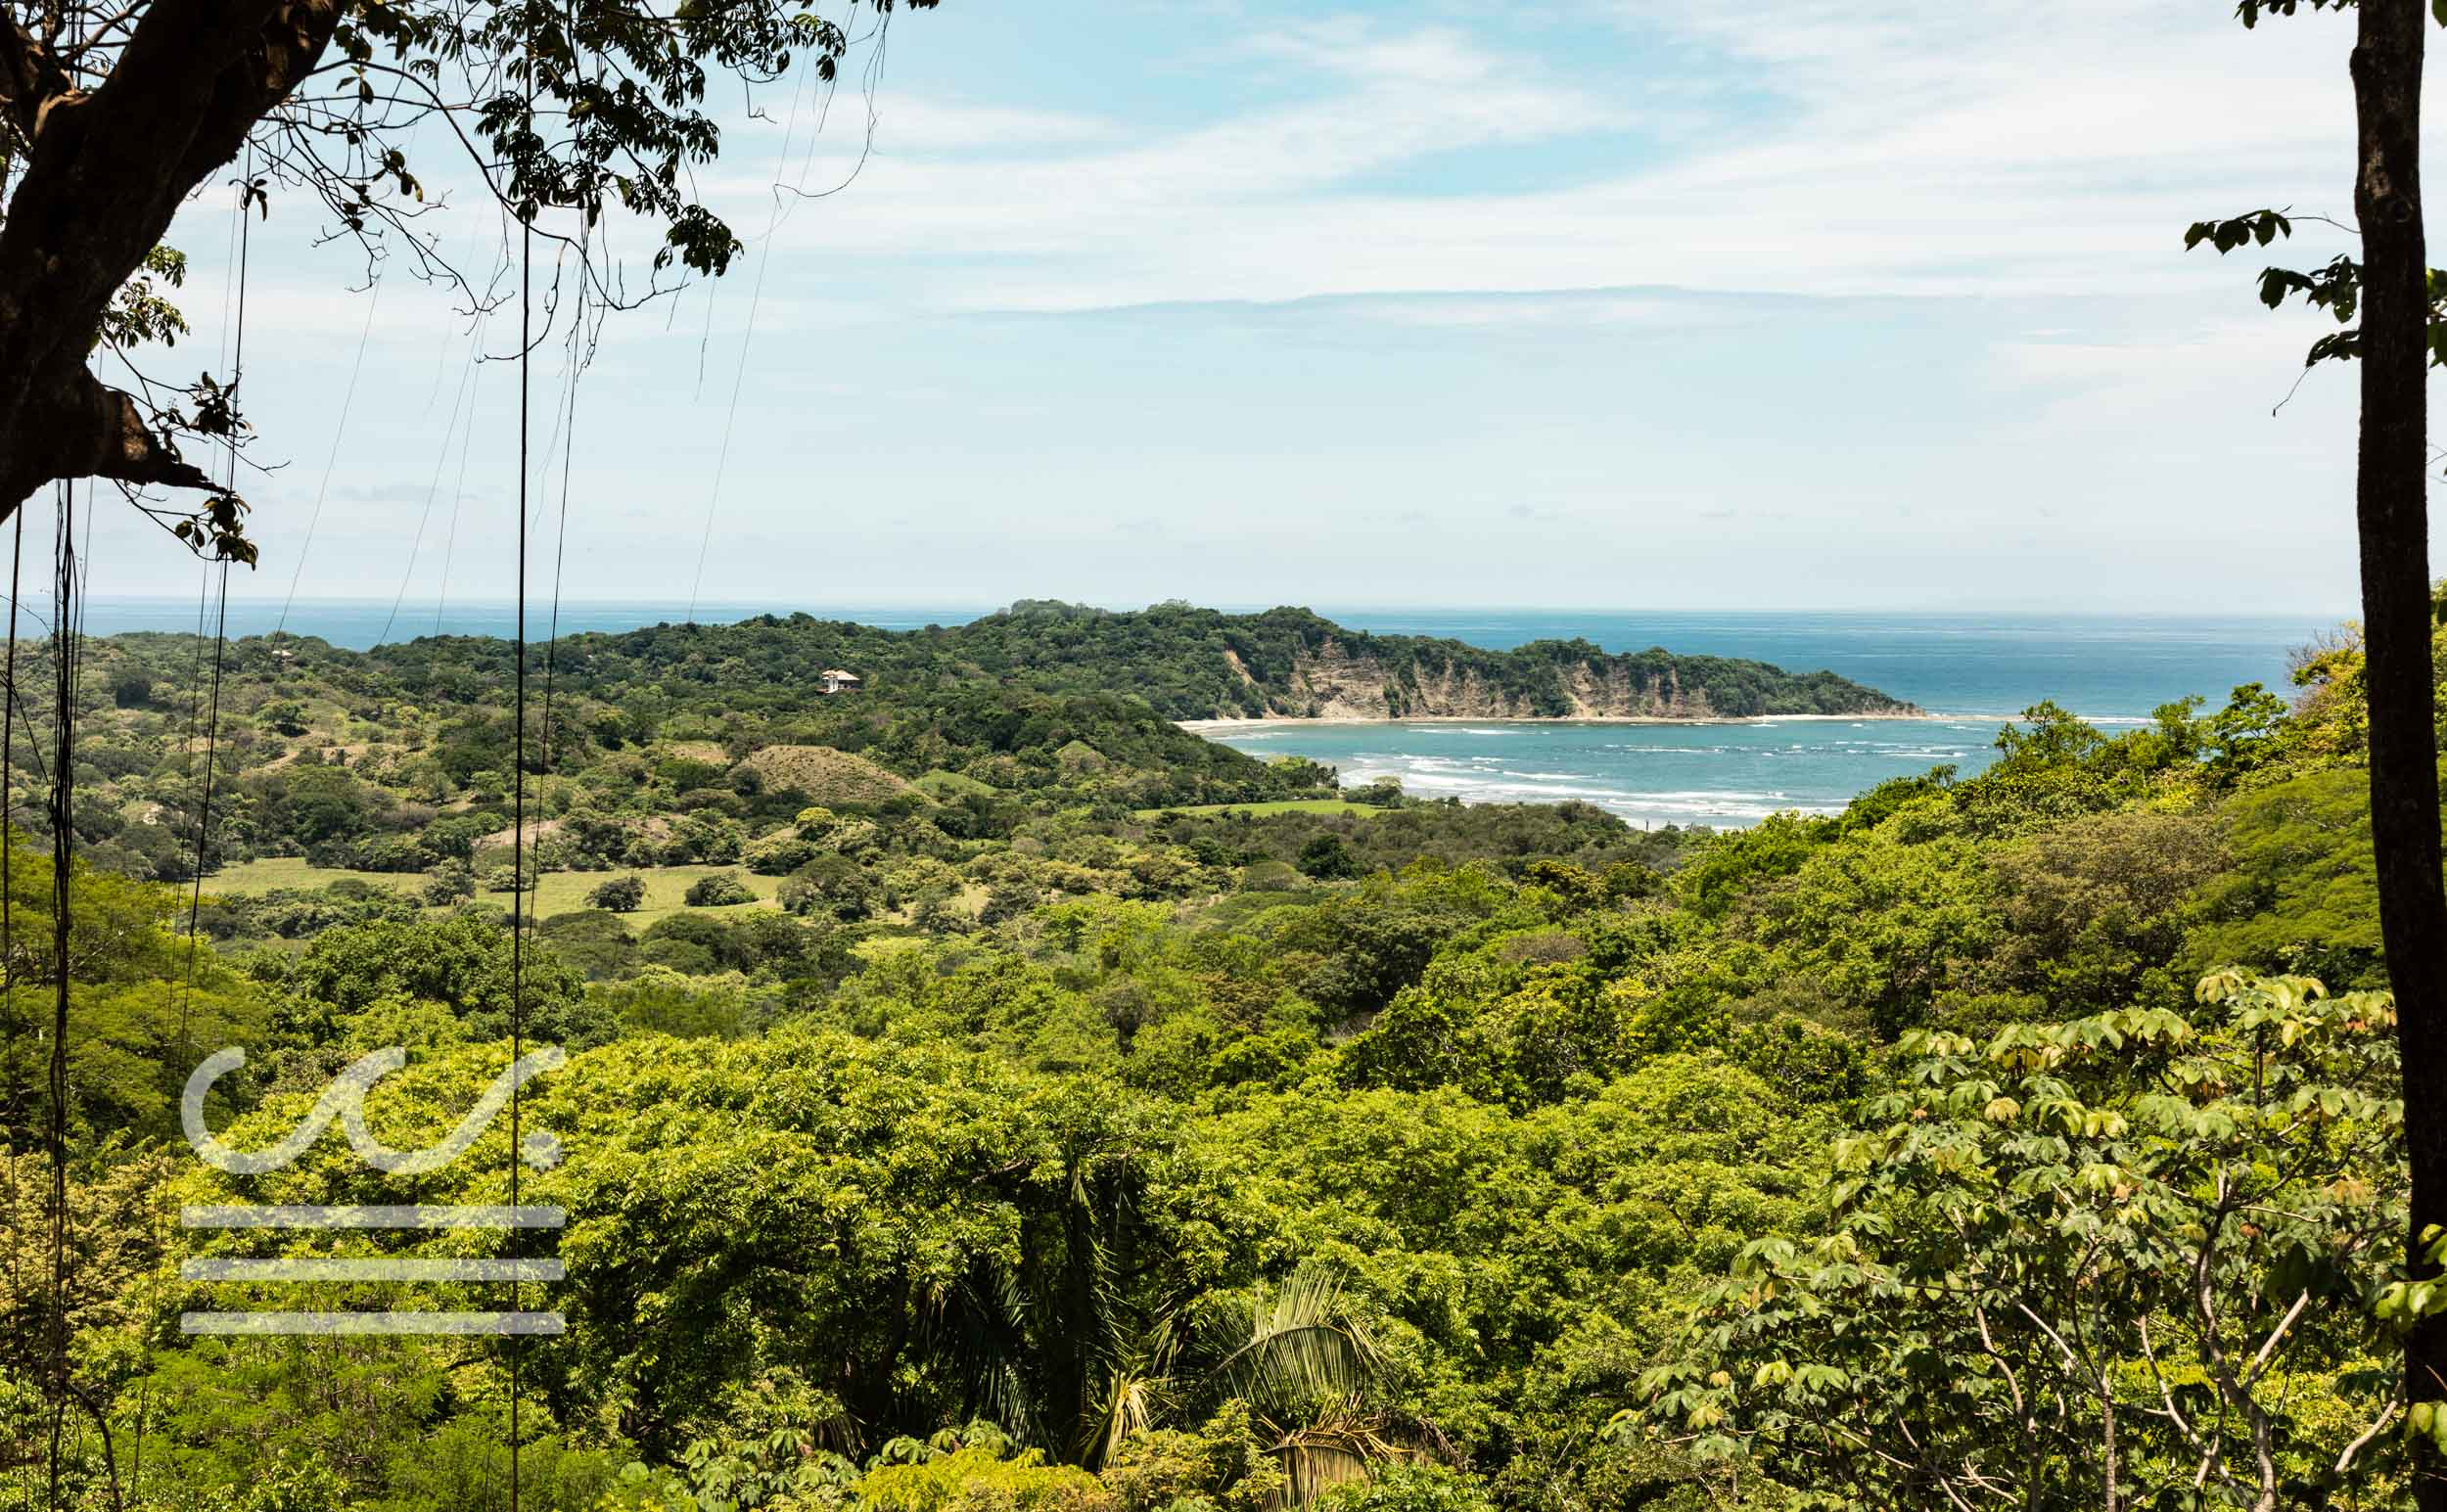 EE-102-Lot-Wanderlust-Realty-Real-Estate-Nosara-Costa-Rica-6.jpg